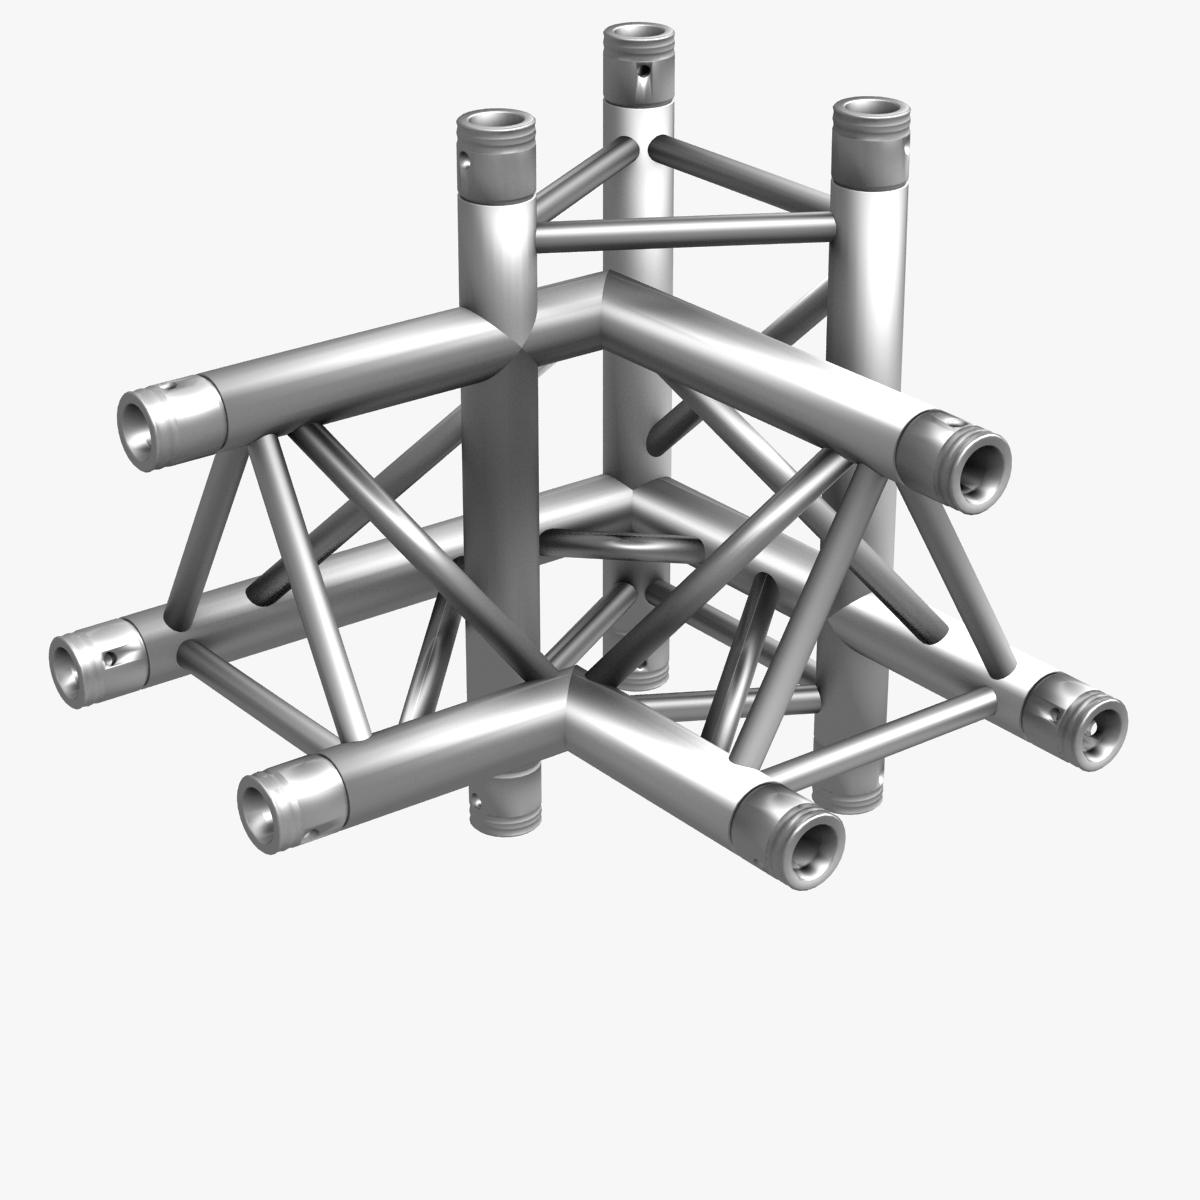 triangular trusses (collection 55 modular pieces) 3d model 3ds max dxf fbx c4d dae texture obj 216241